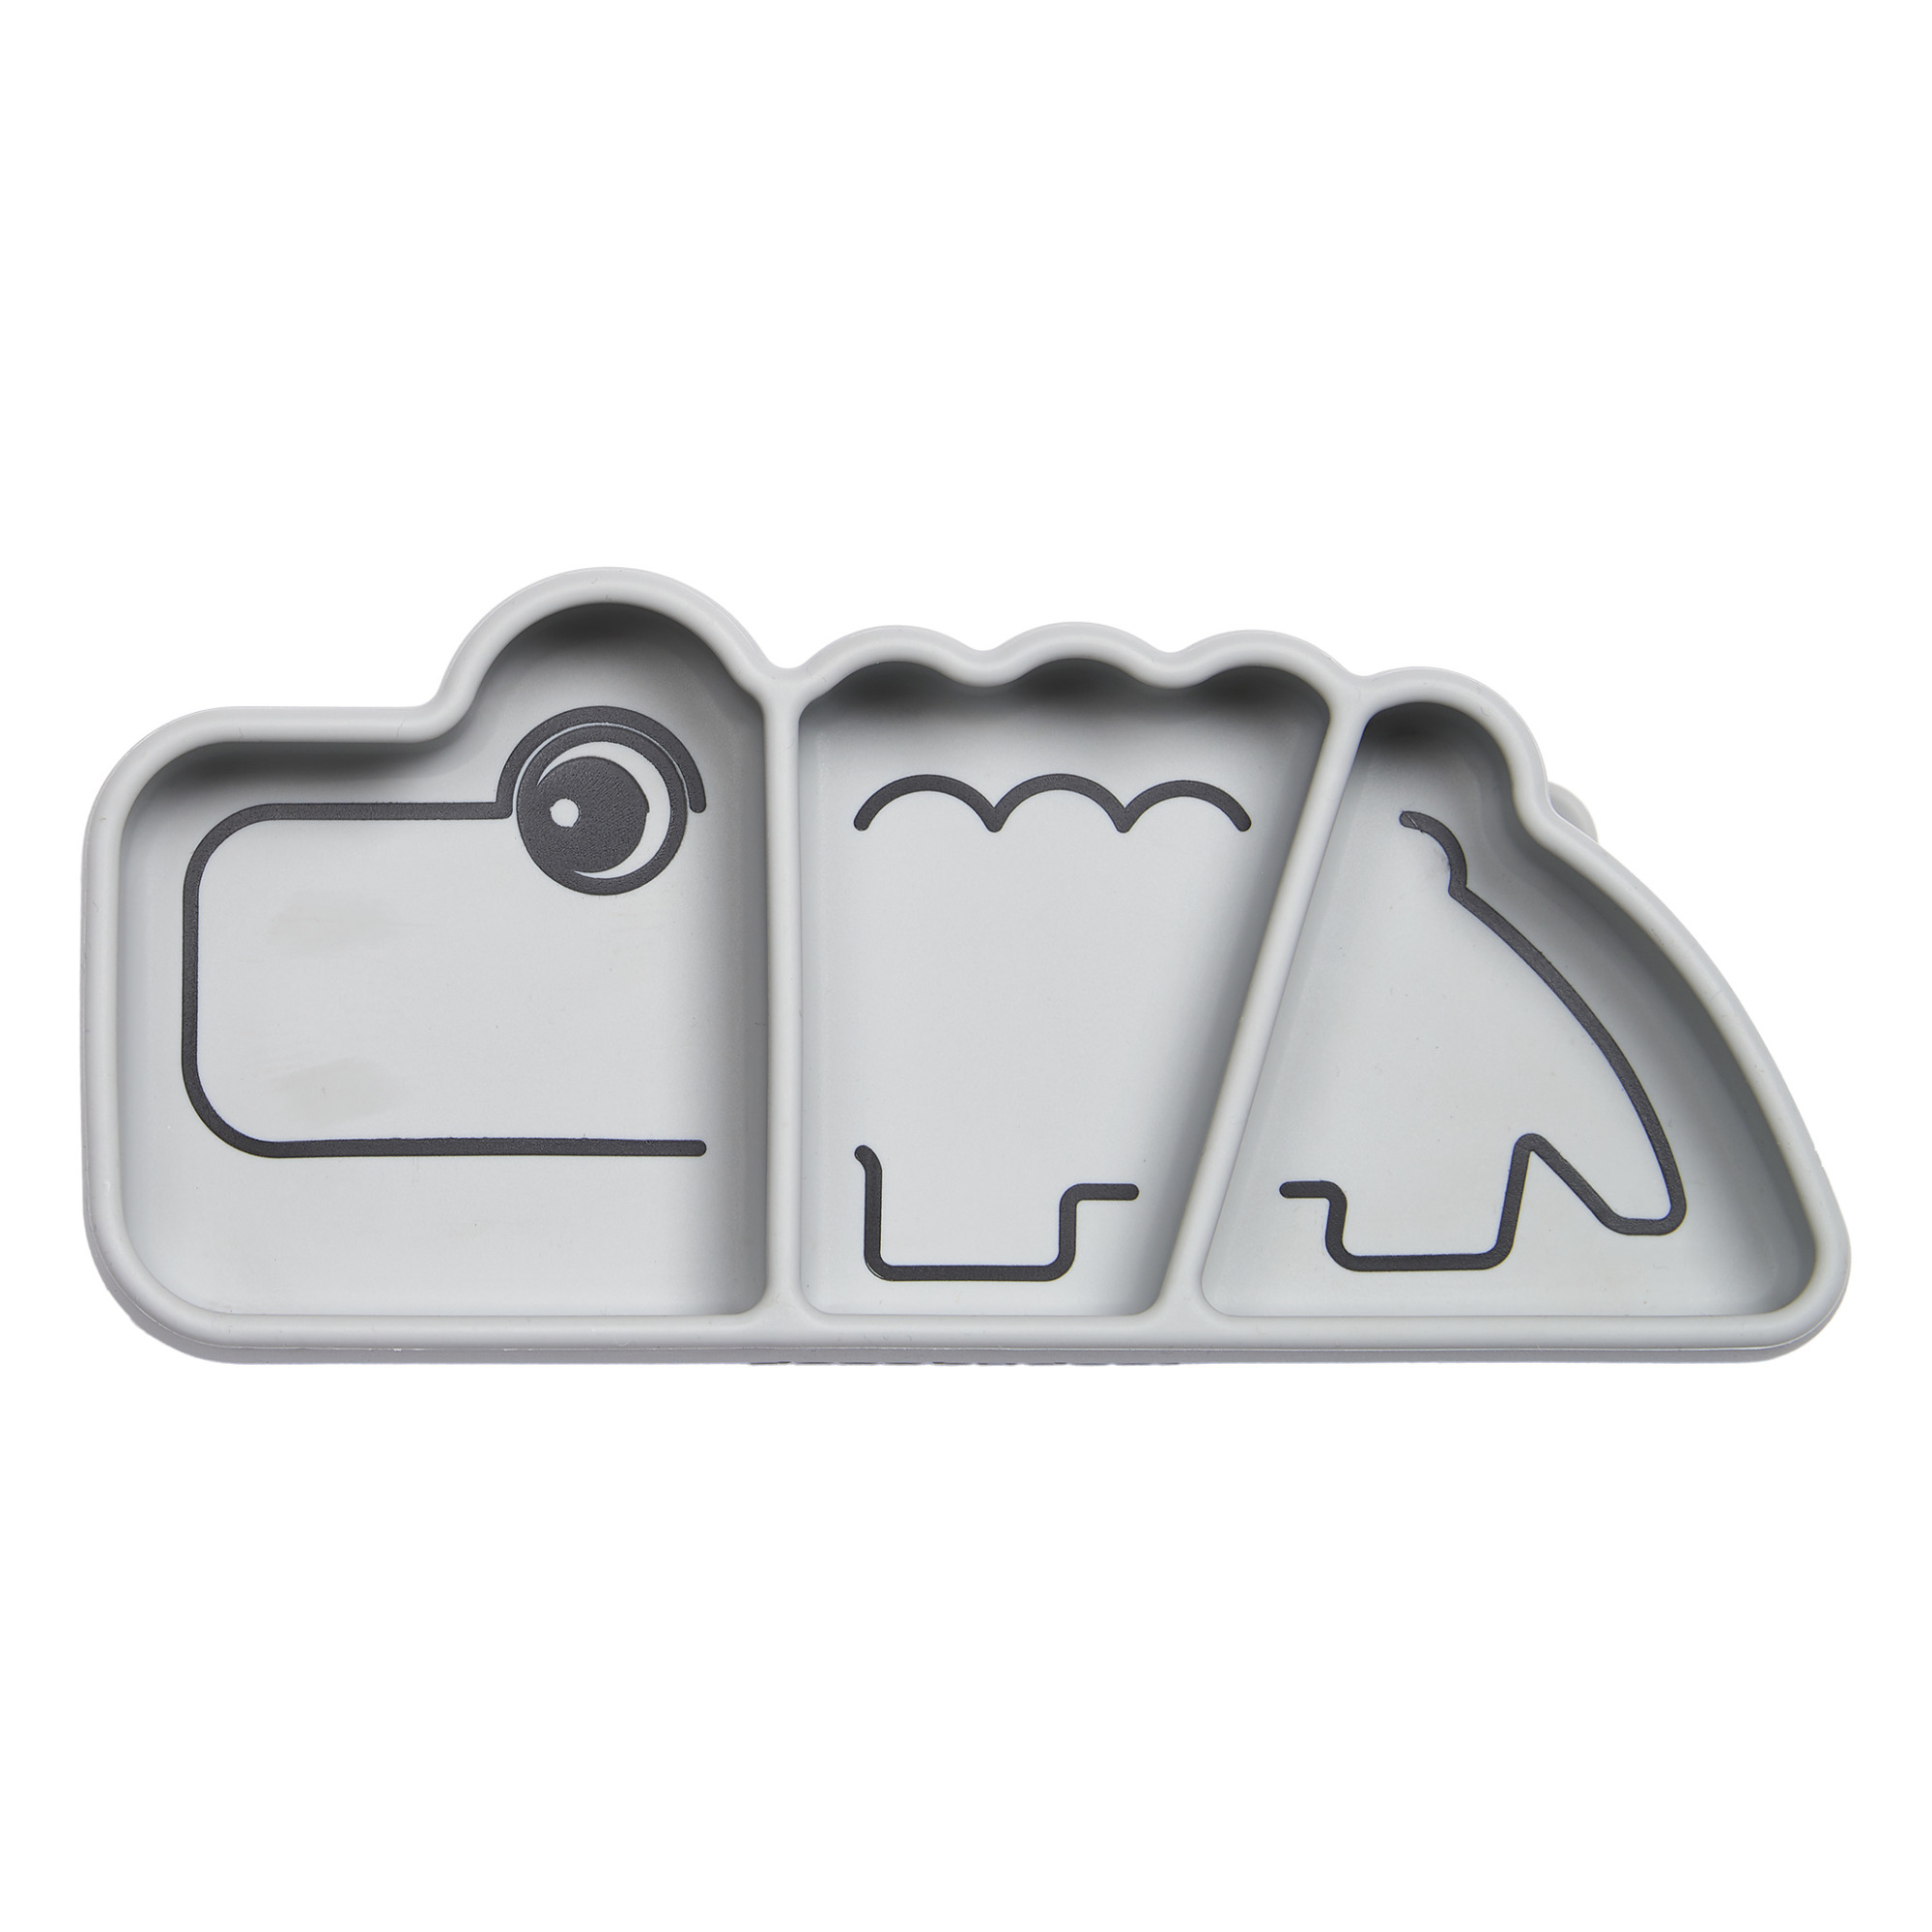 Plan De Travail Mobile croc silicone plate grey donedeer design children